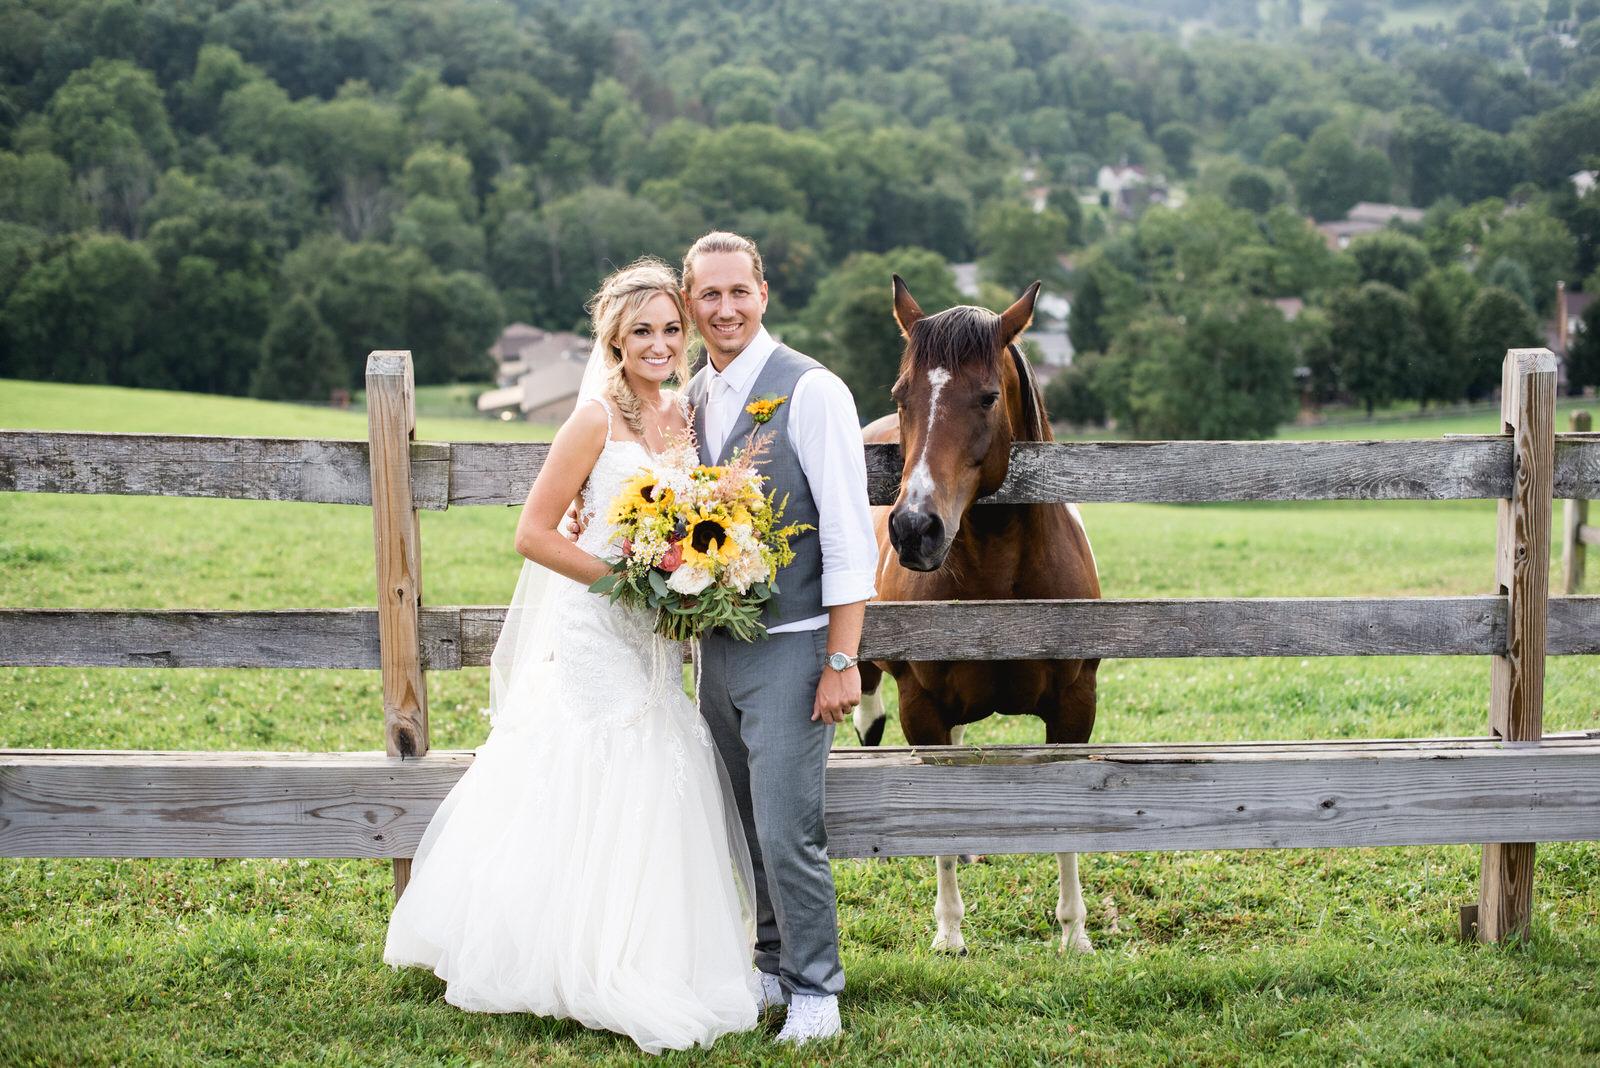 destiny-hill-farm-wedding-photos-pittsburgh-wedding-photographers-65.jpg